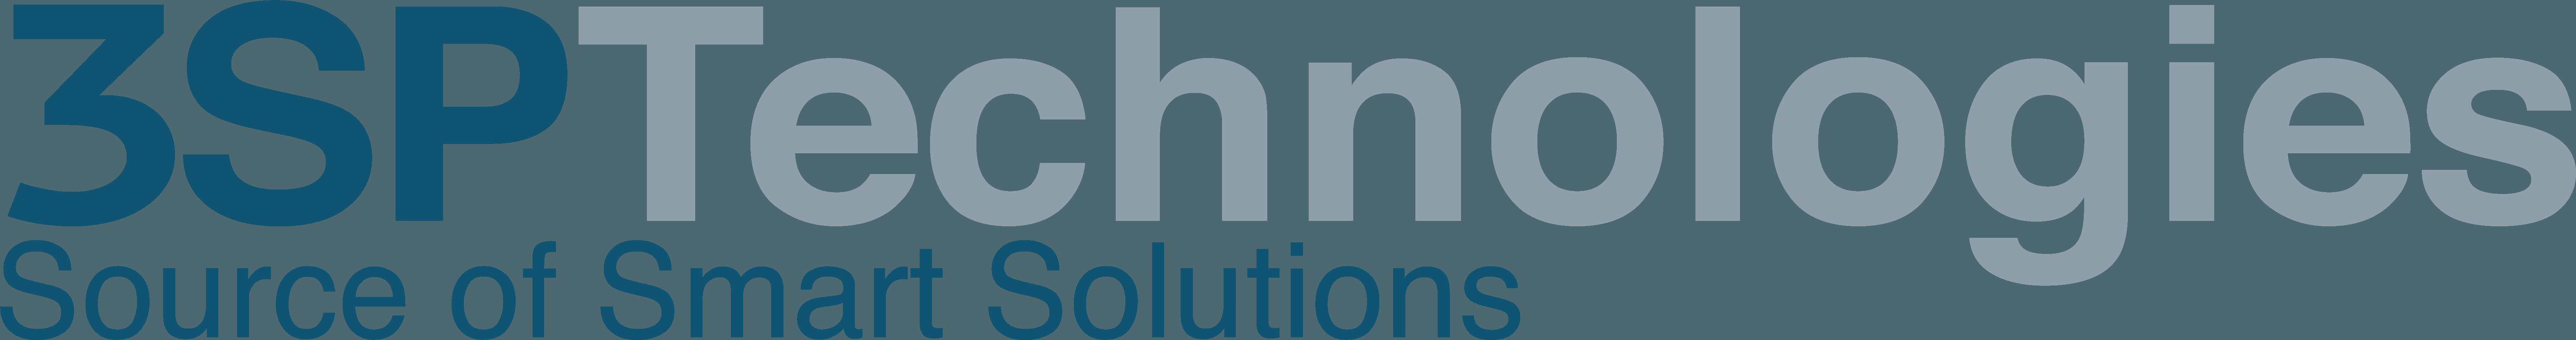 Logo 3SP TECHNOLOGIES